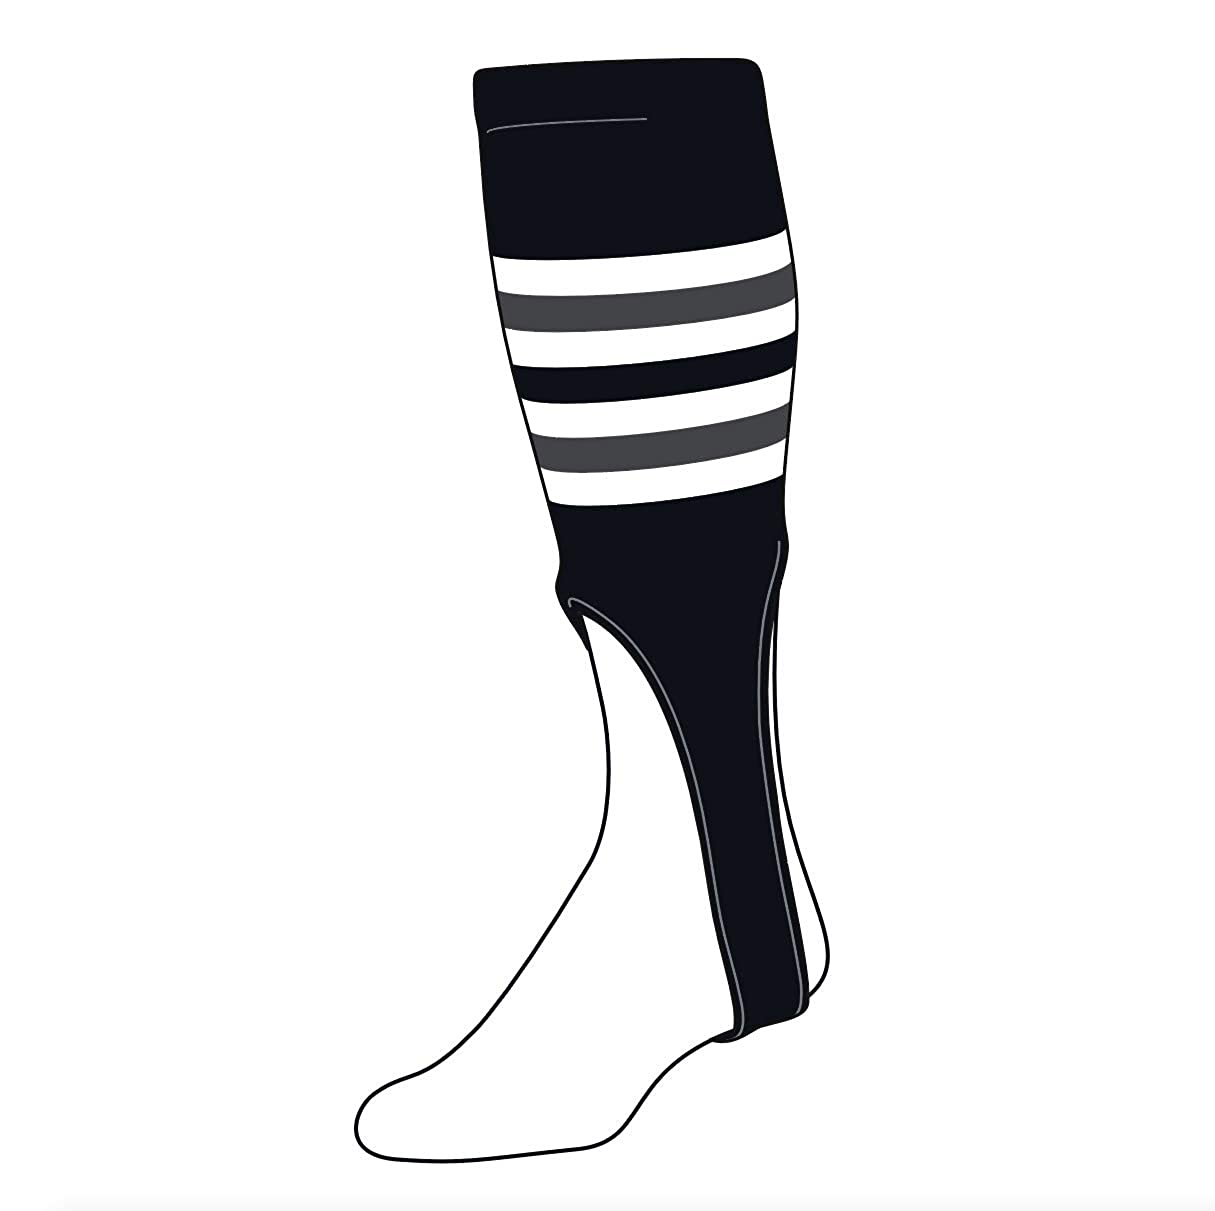 TCK Socks SOCKSHOSIERY メンズ US サイズ: Large years) 19 19 inch Socks (16+ years) B07N5CYKBY, ぼらんち【VOLANTE】:179d41c9 --- cgt-tbc.fr